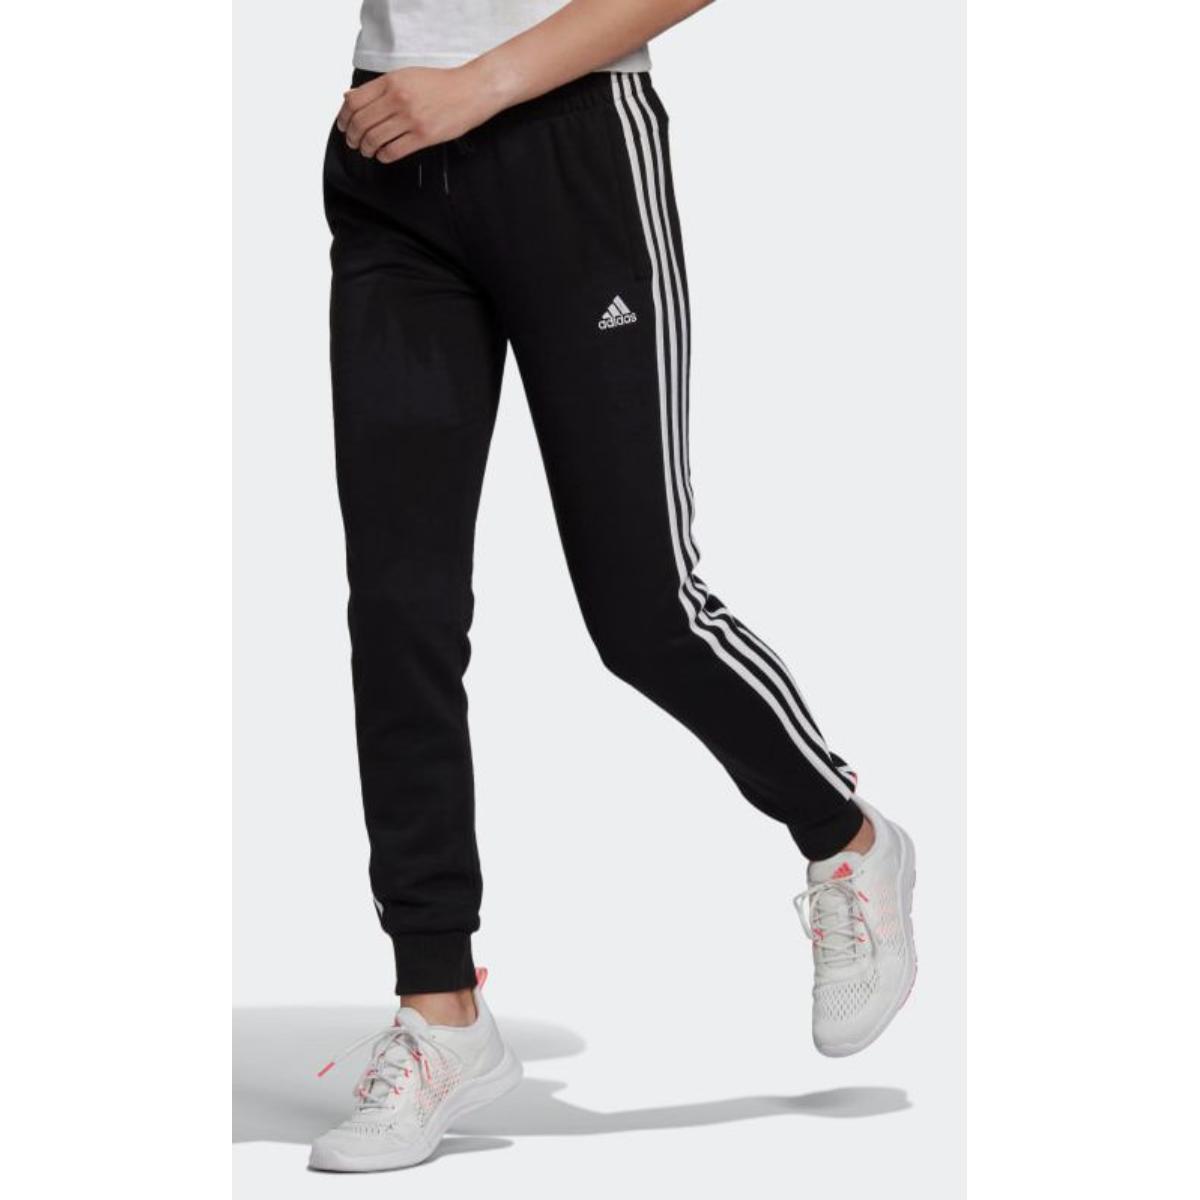 Calça Masculina Adidas Gk8831 m 3s Preto/branco